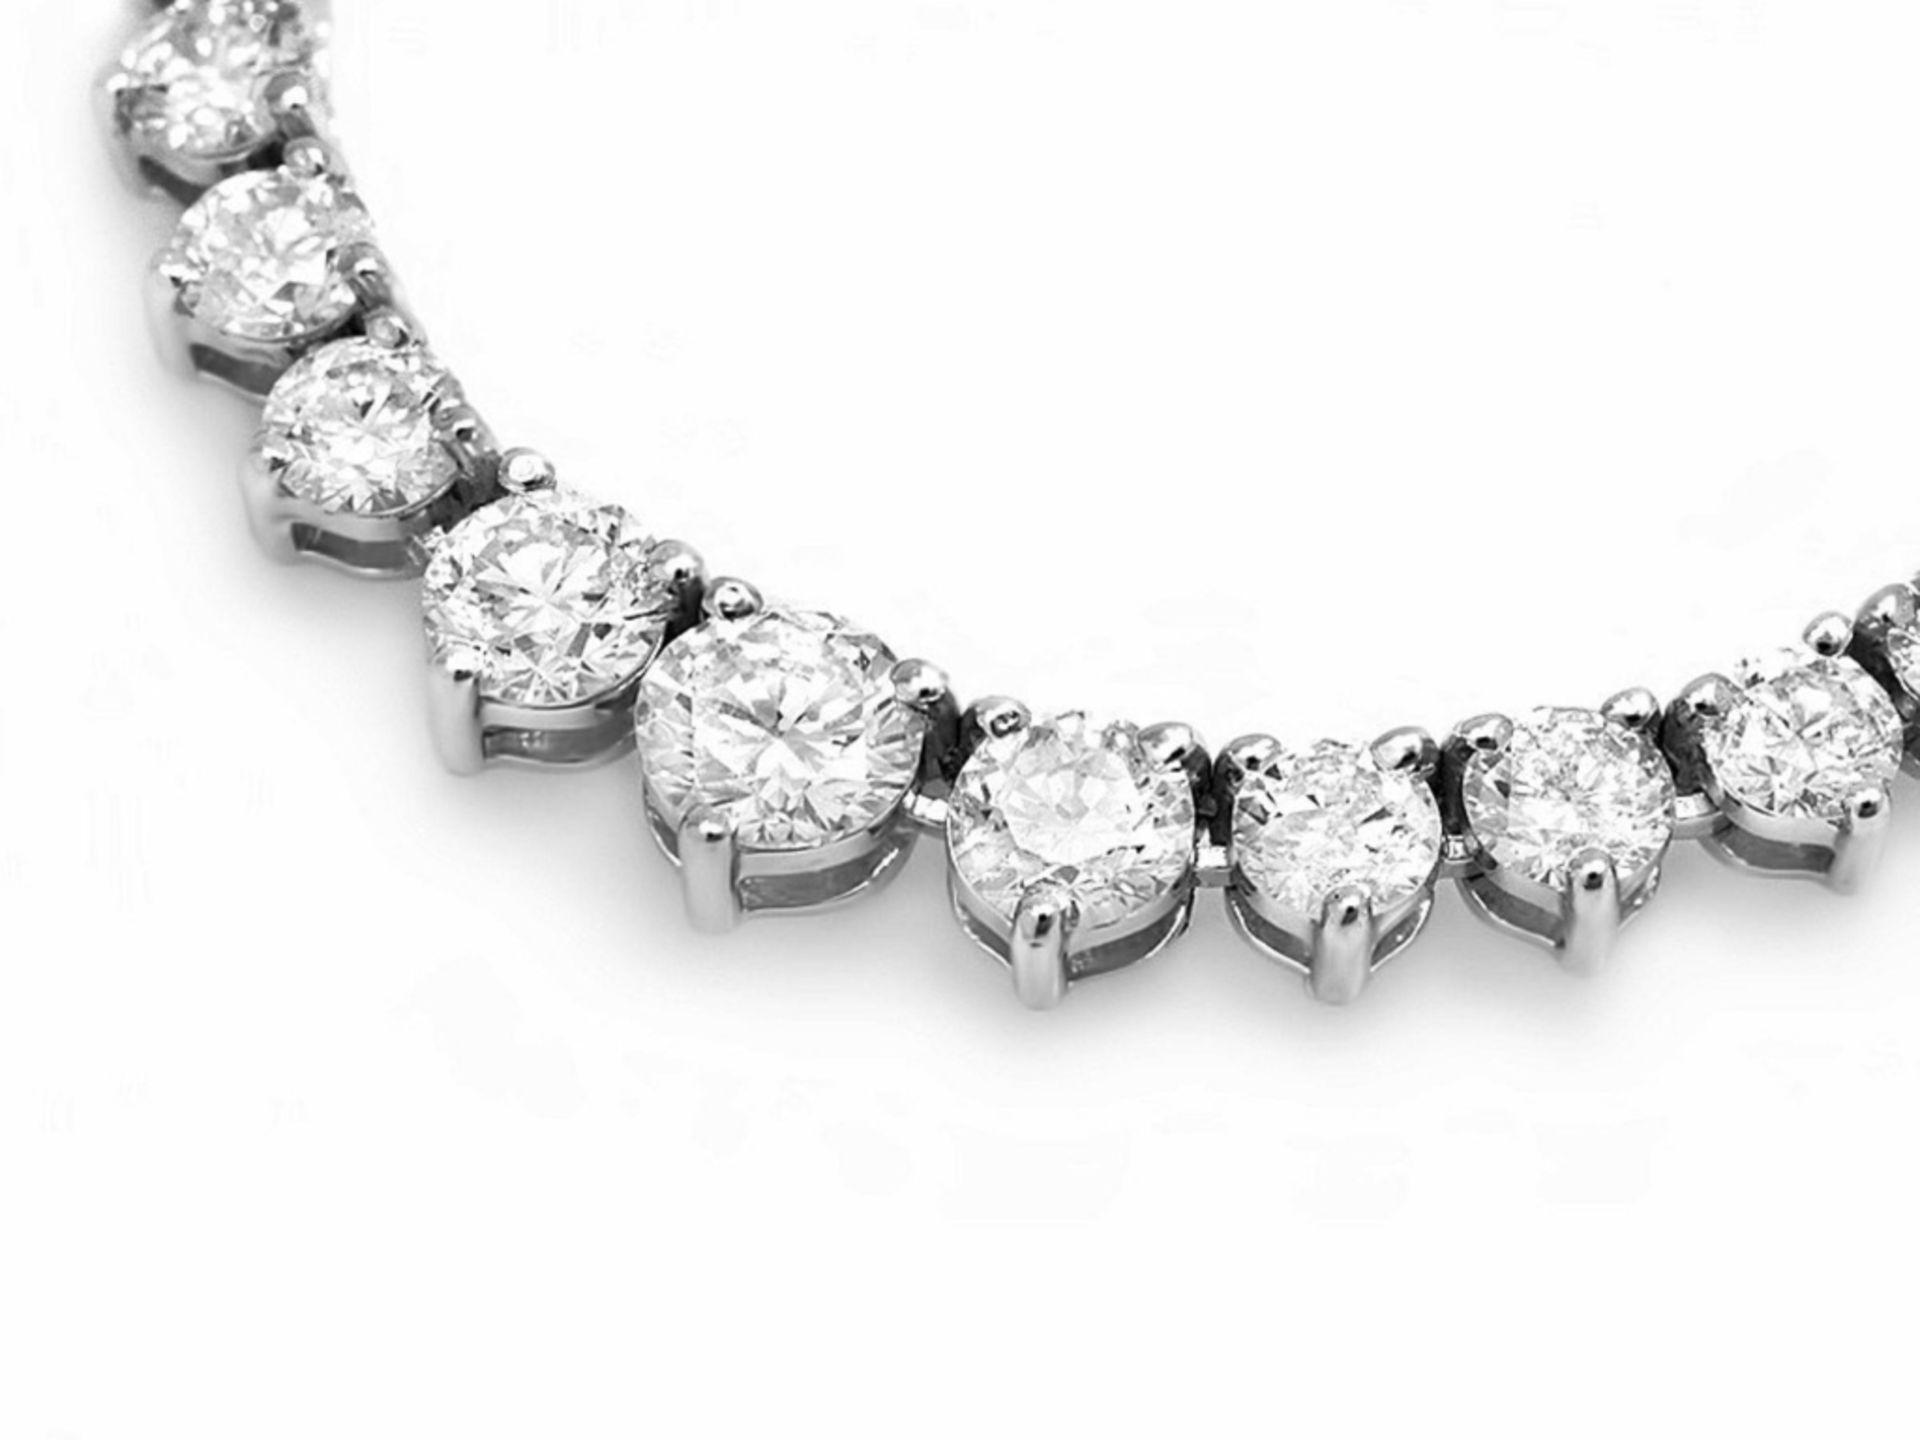 ^18k White Gold 9.00ct Diamond Necklace - Image 3 of 5